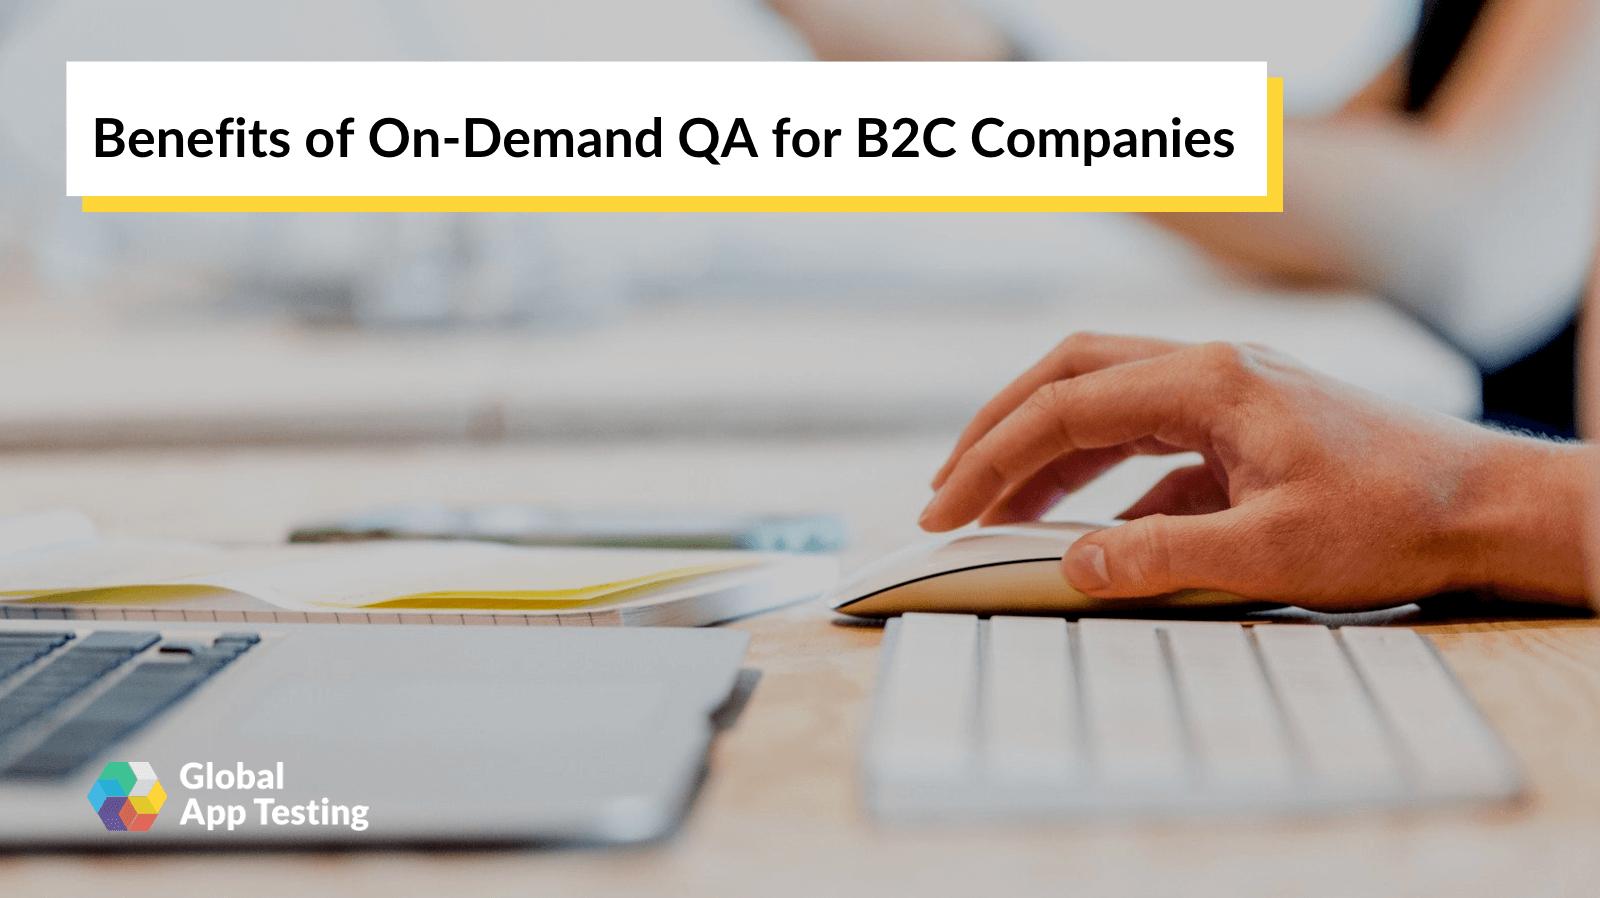 Benefits of On-Demand QA for B2C Companies